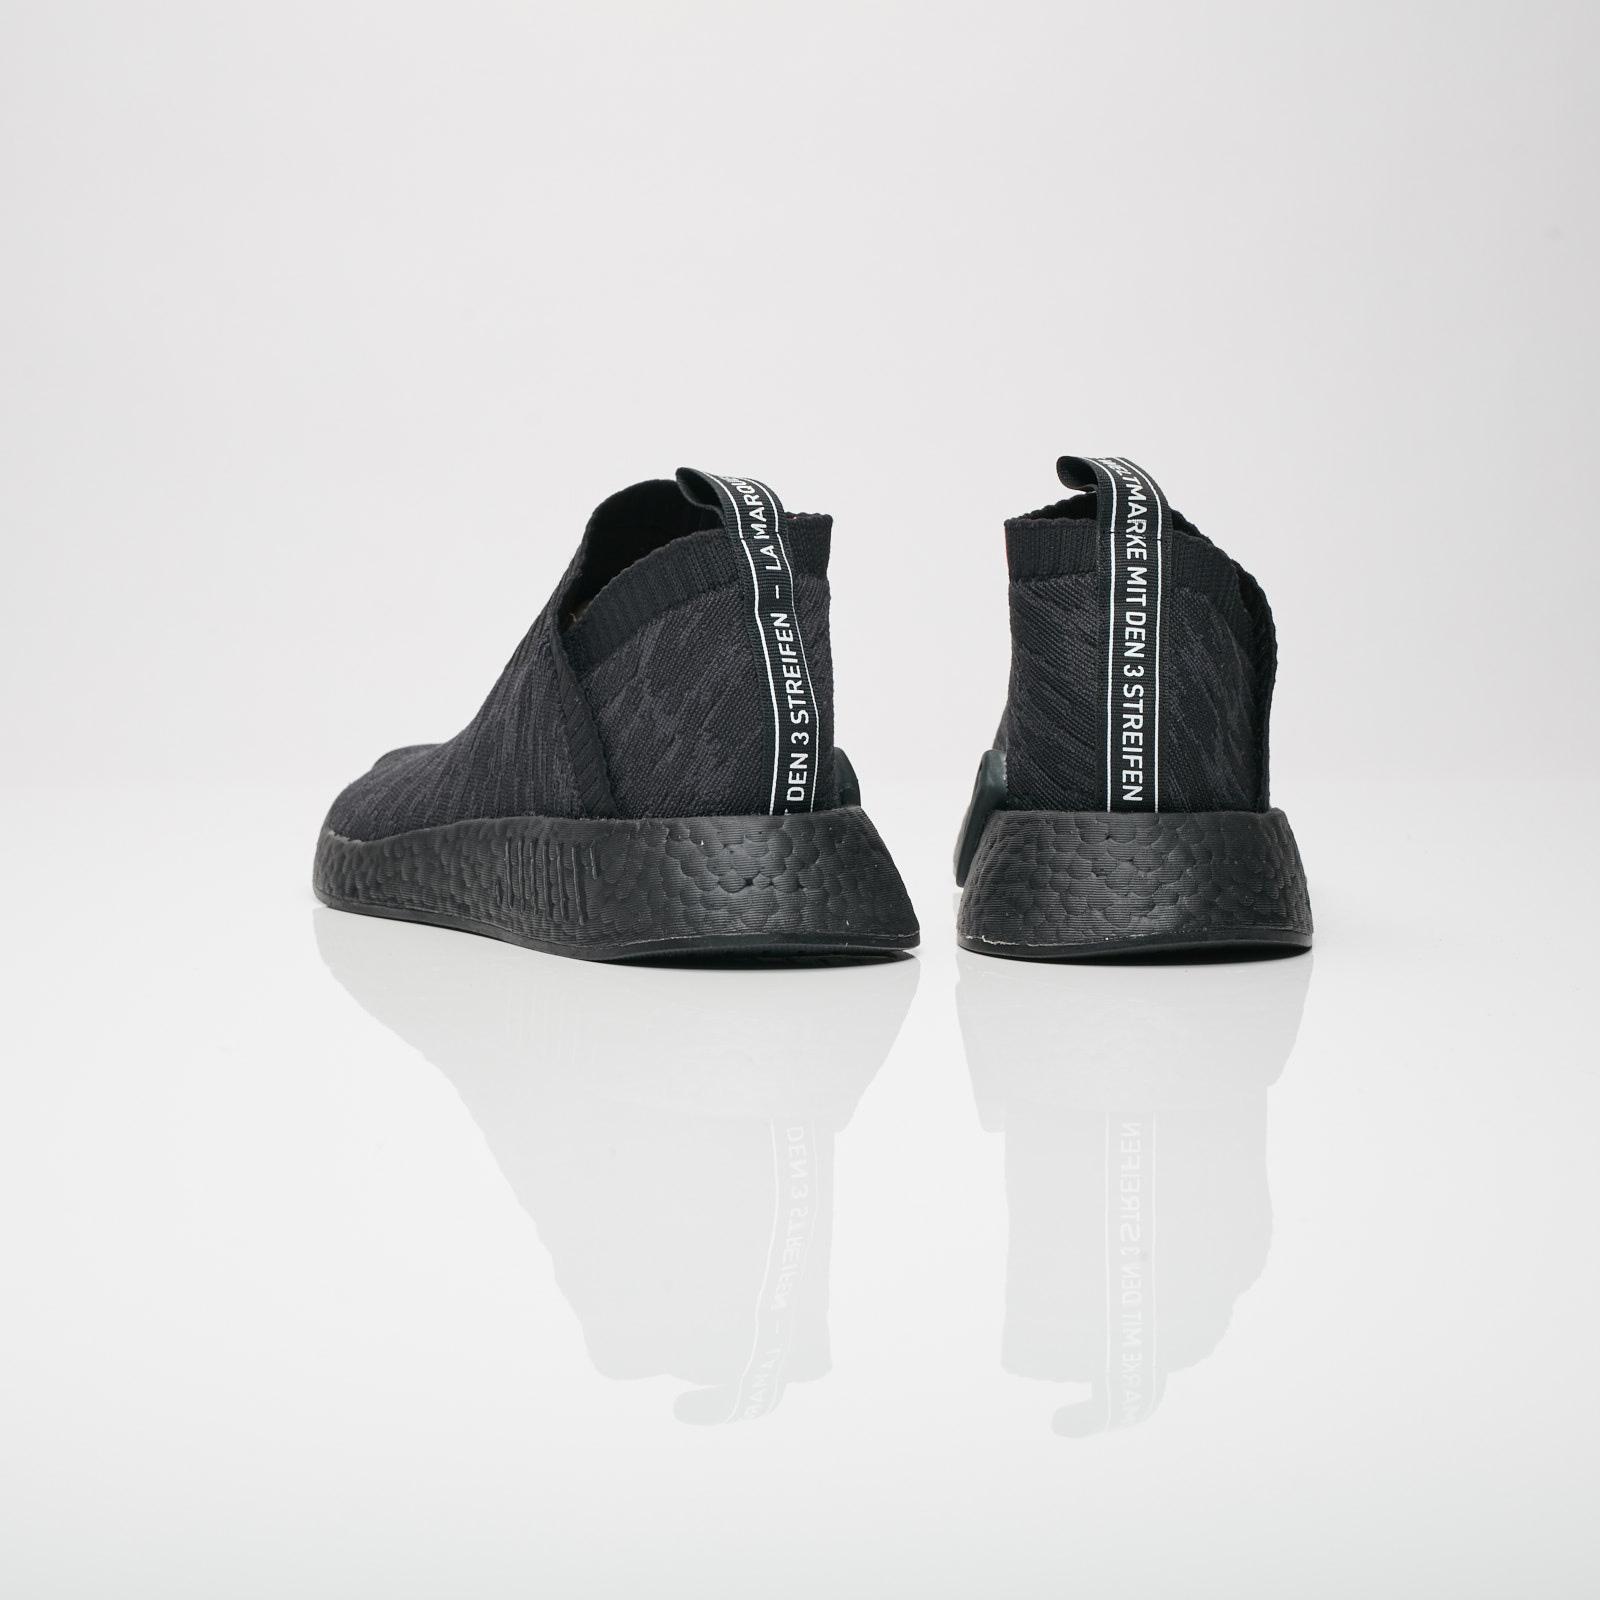 huge selection of 96991 f0f63 adidas Originals NMD CS2 PK adidas Originals NMD CS2 PK ...